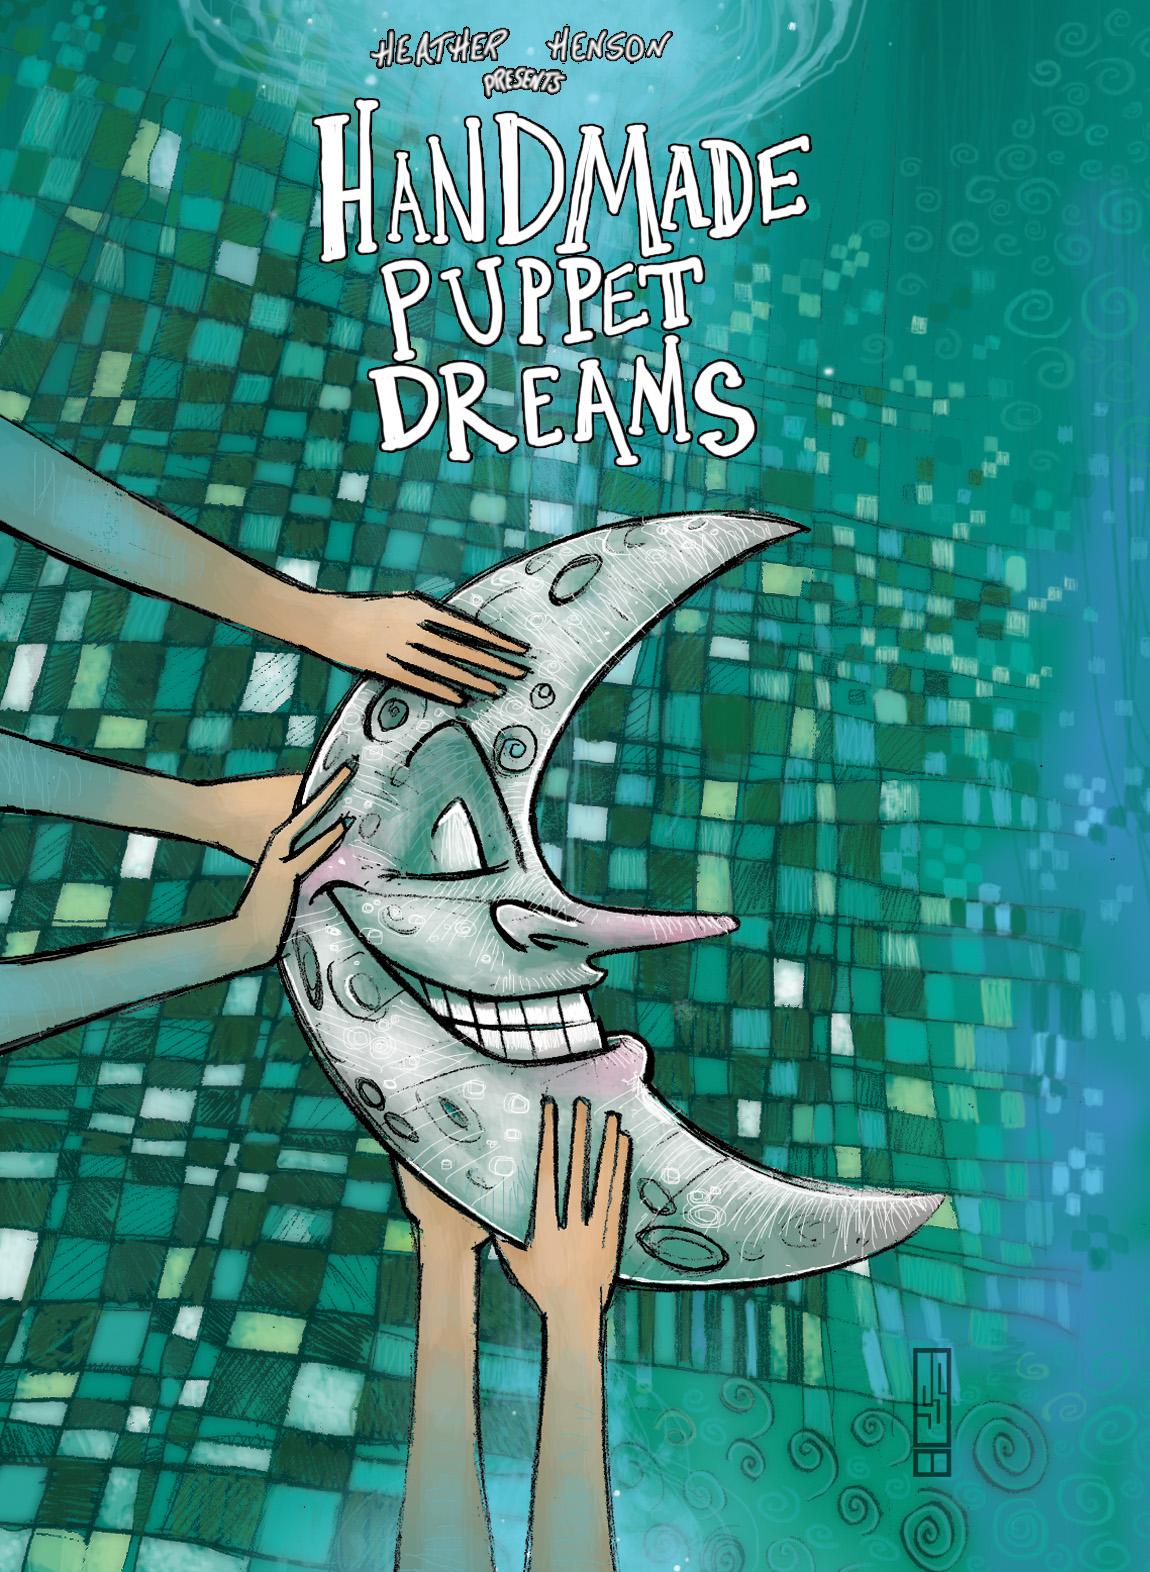 handmade puppet dreams